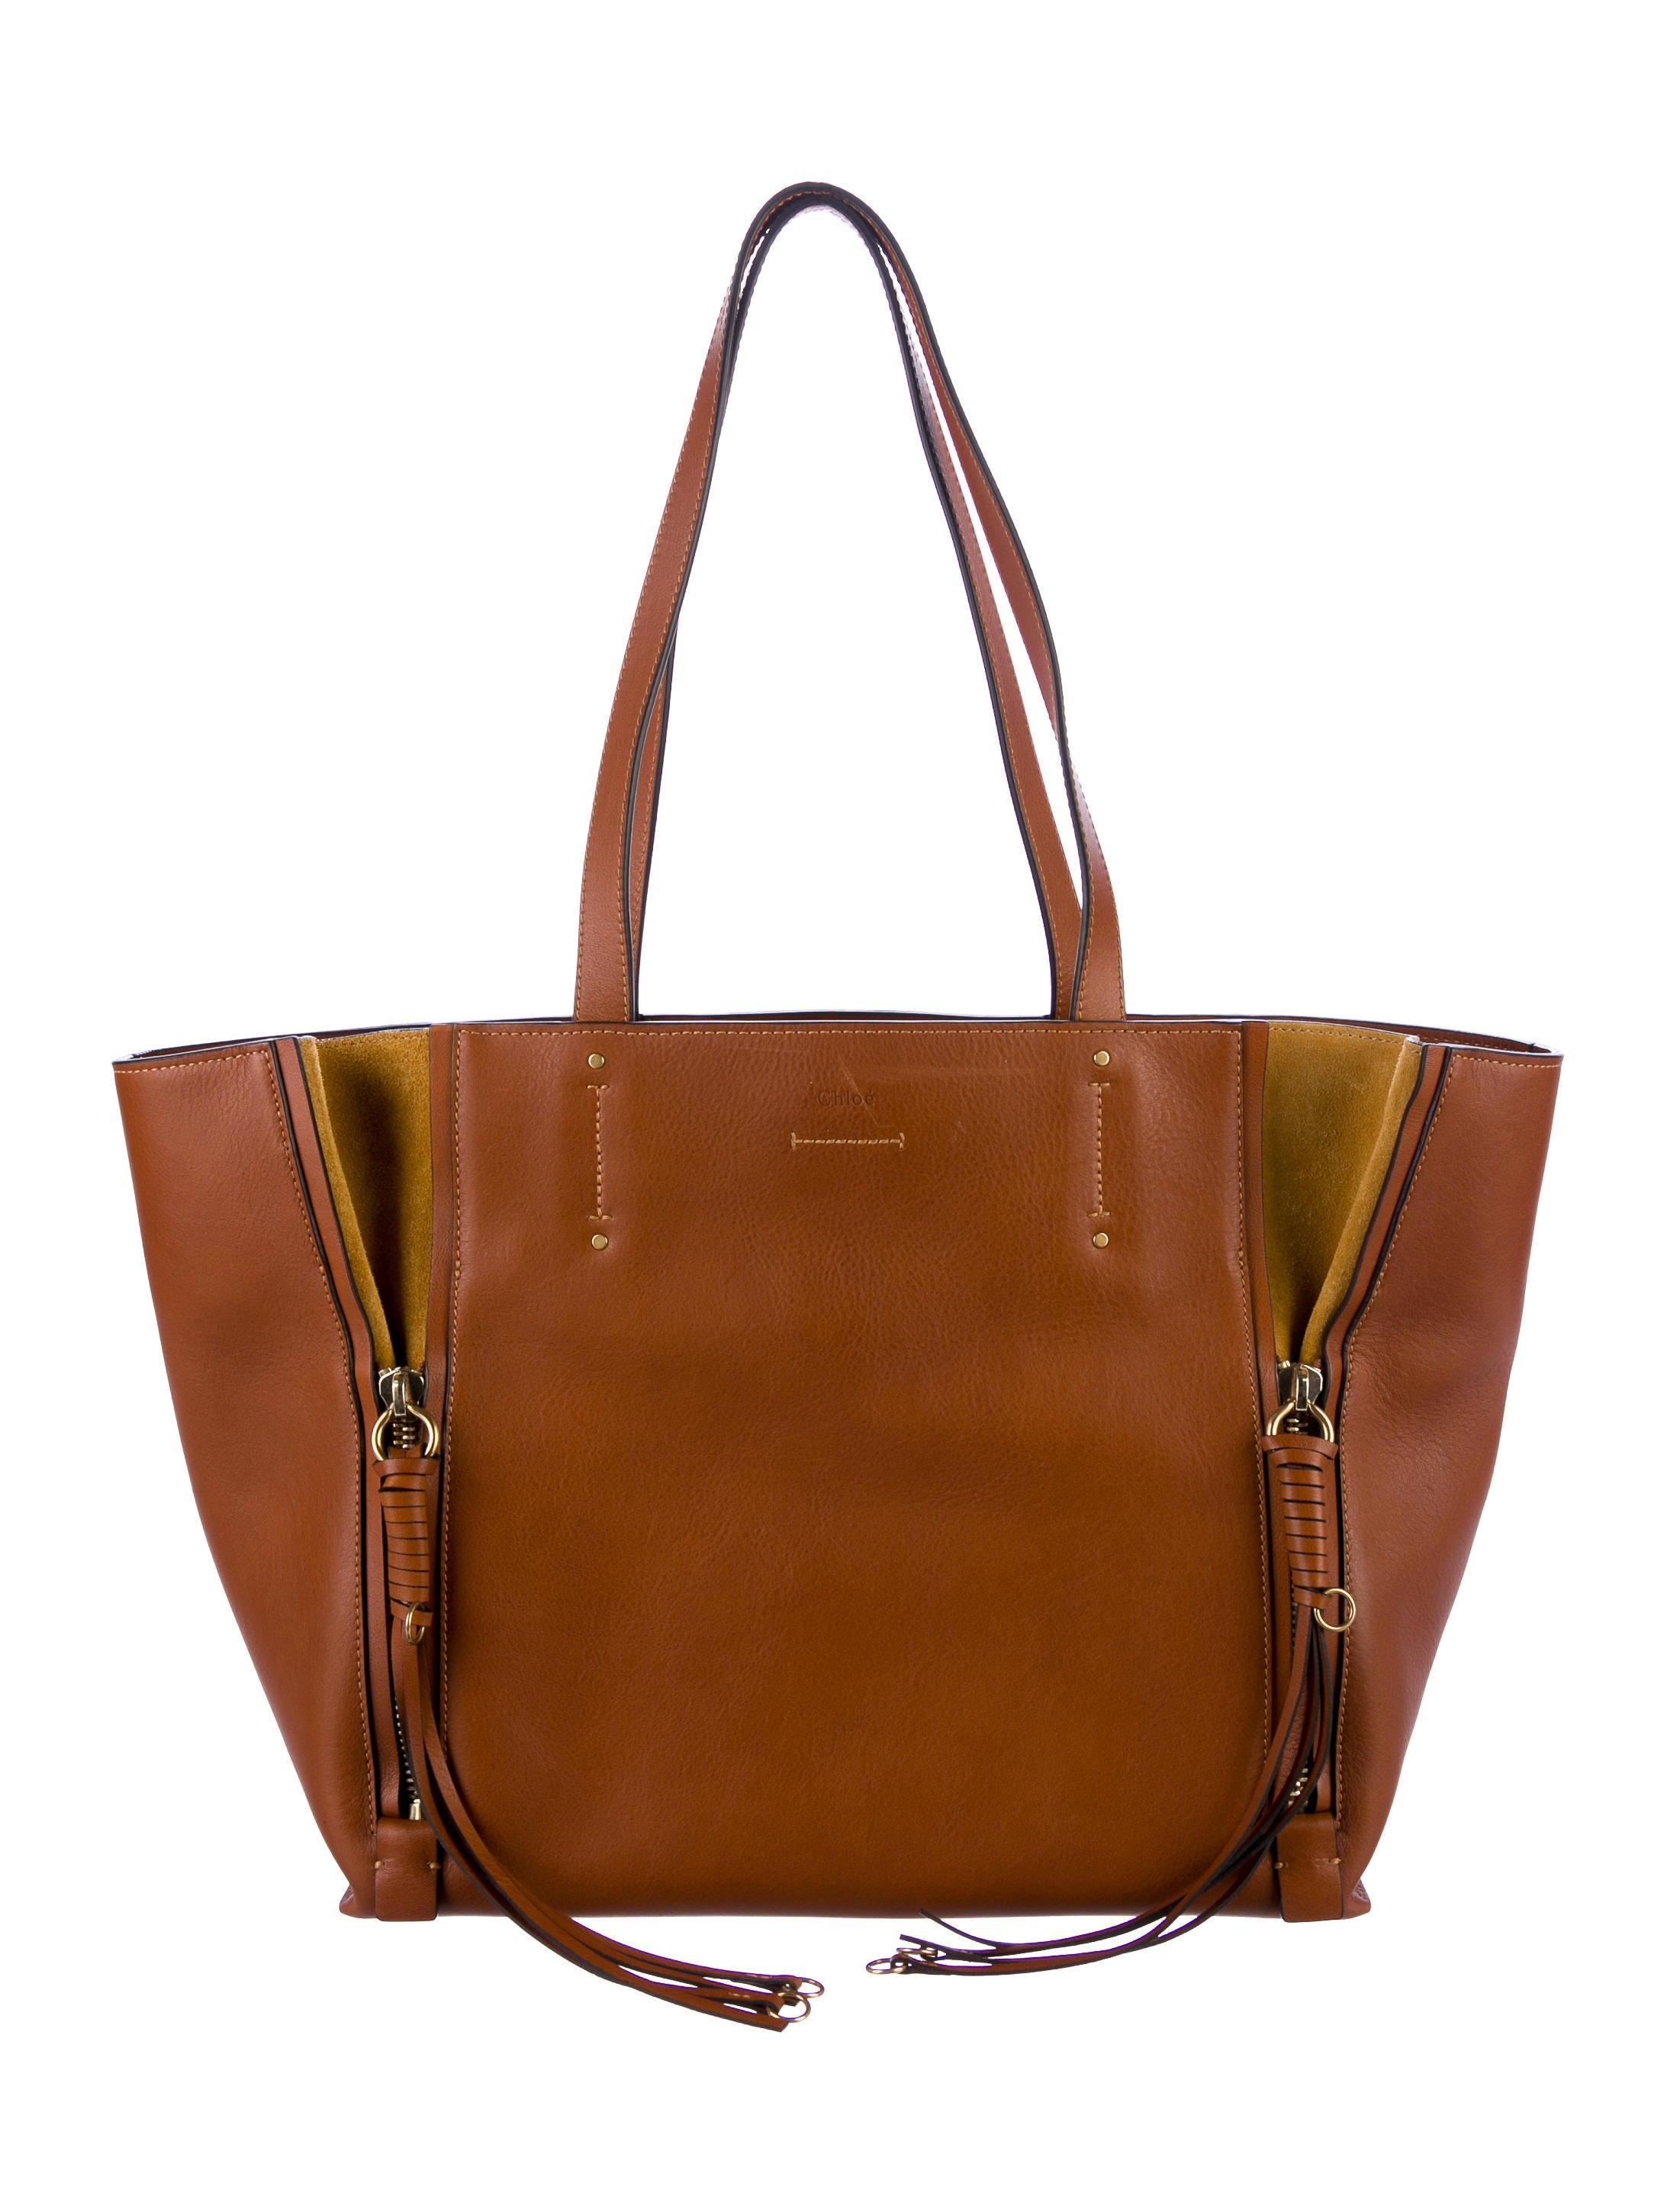 6267695a0 Chloé Milo Medium Tote - Handbags - CHL66731 | The RealReal